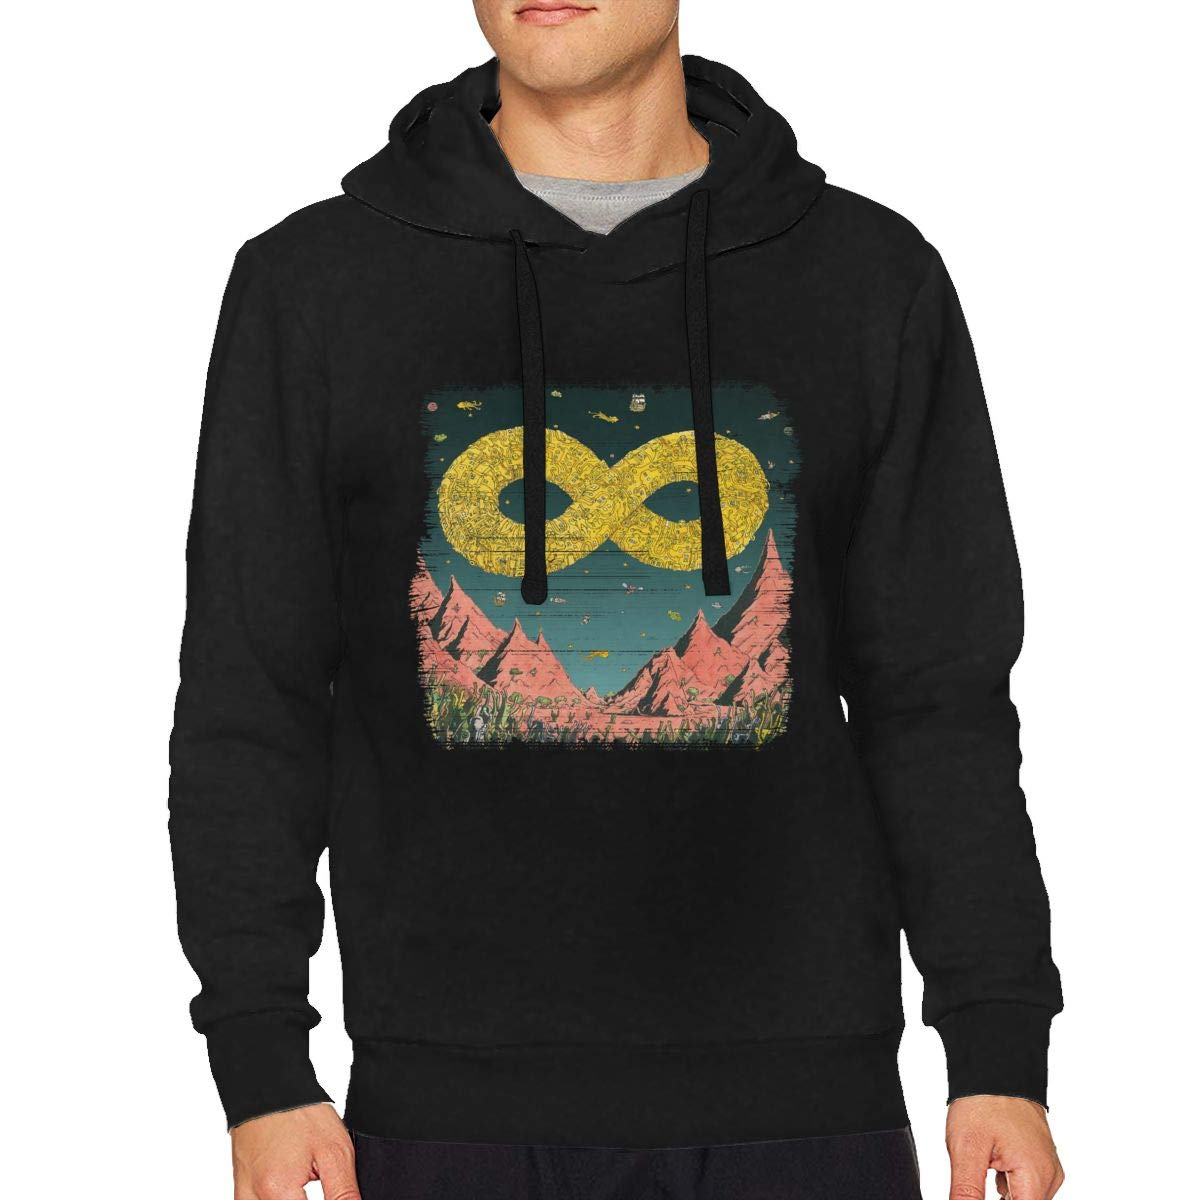 Vicromanko Man S Dance Gavin Dance Mothership Sweater R N Funny Drawstring 6074 Shirts